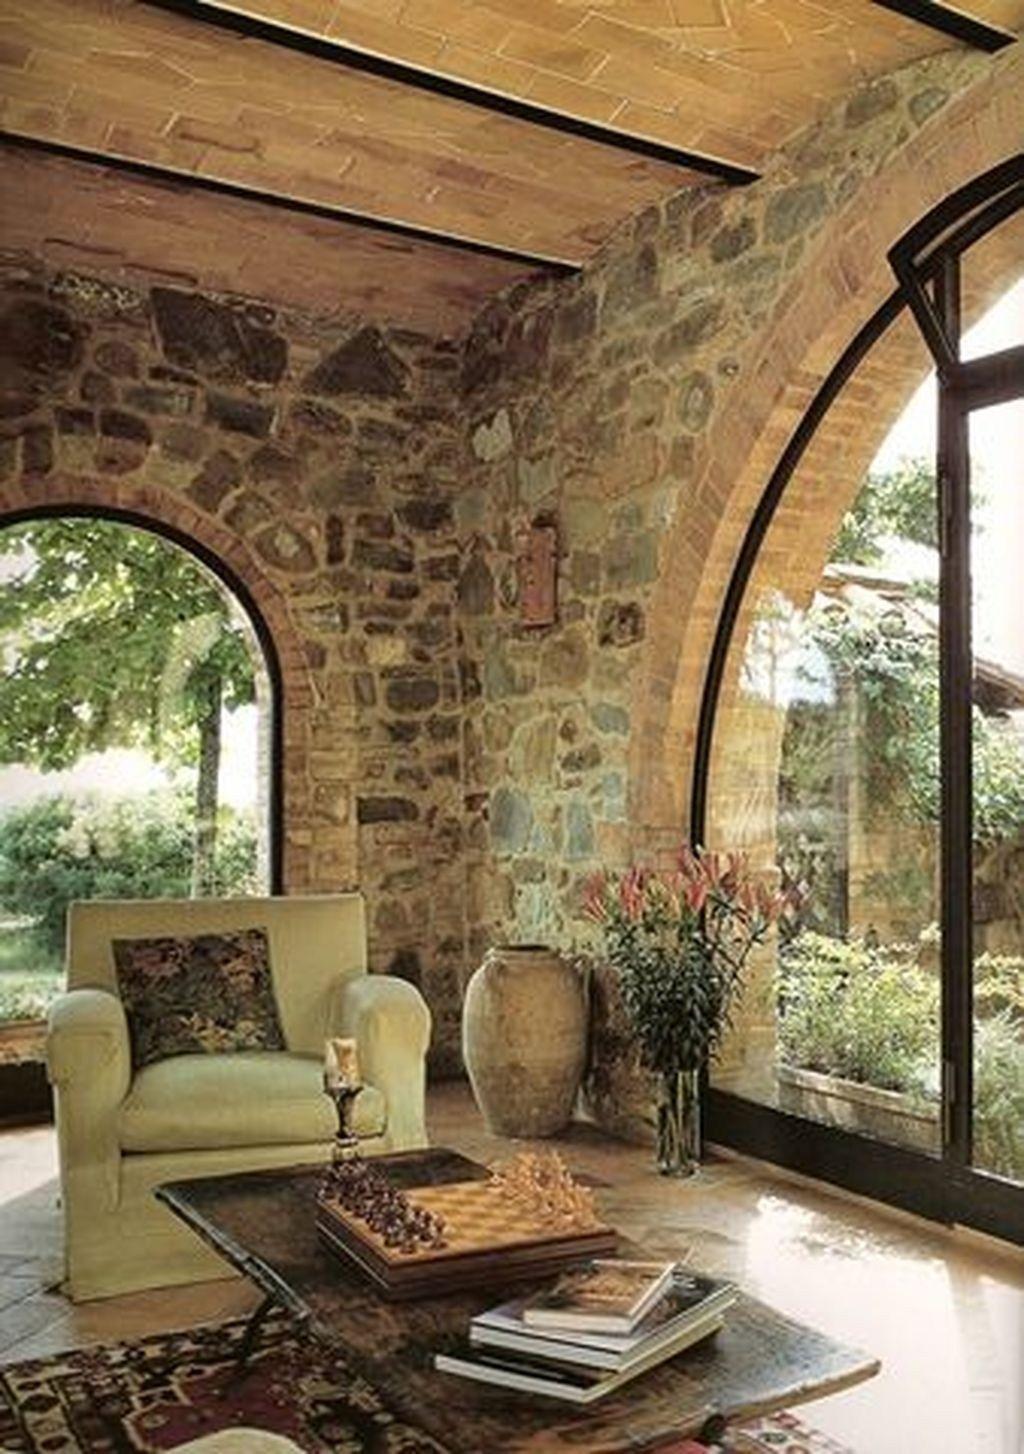 8 The Best Italian Farmhouse Design - Home Design  Italian